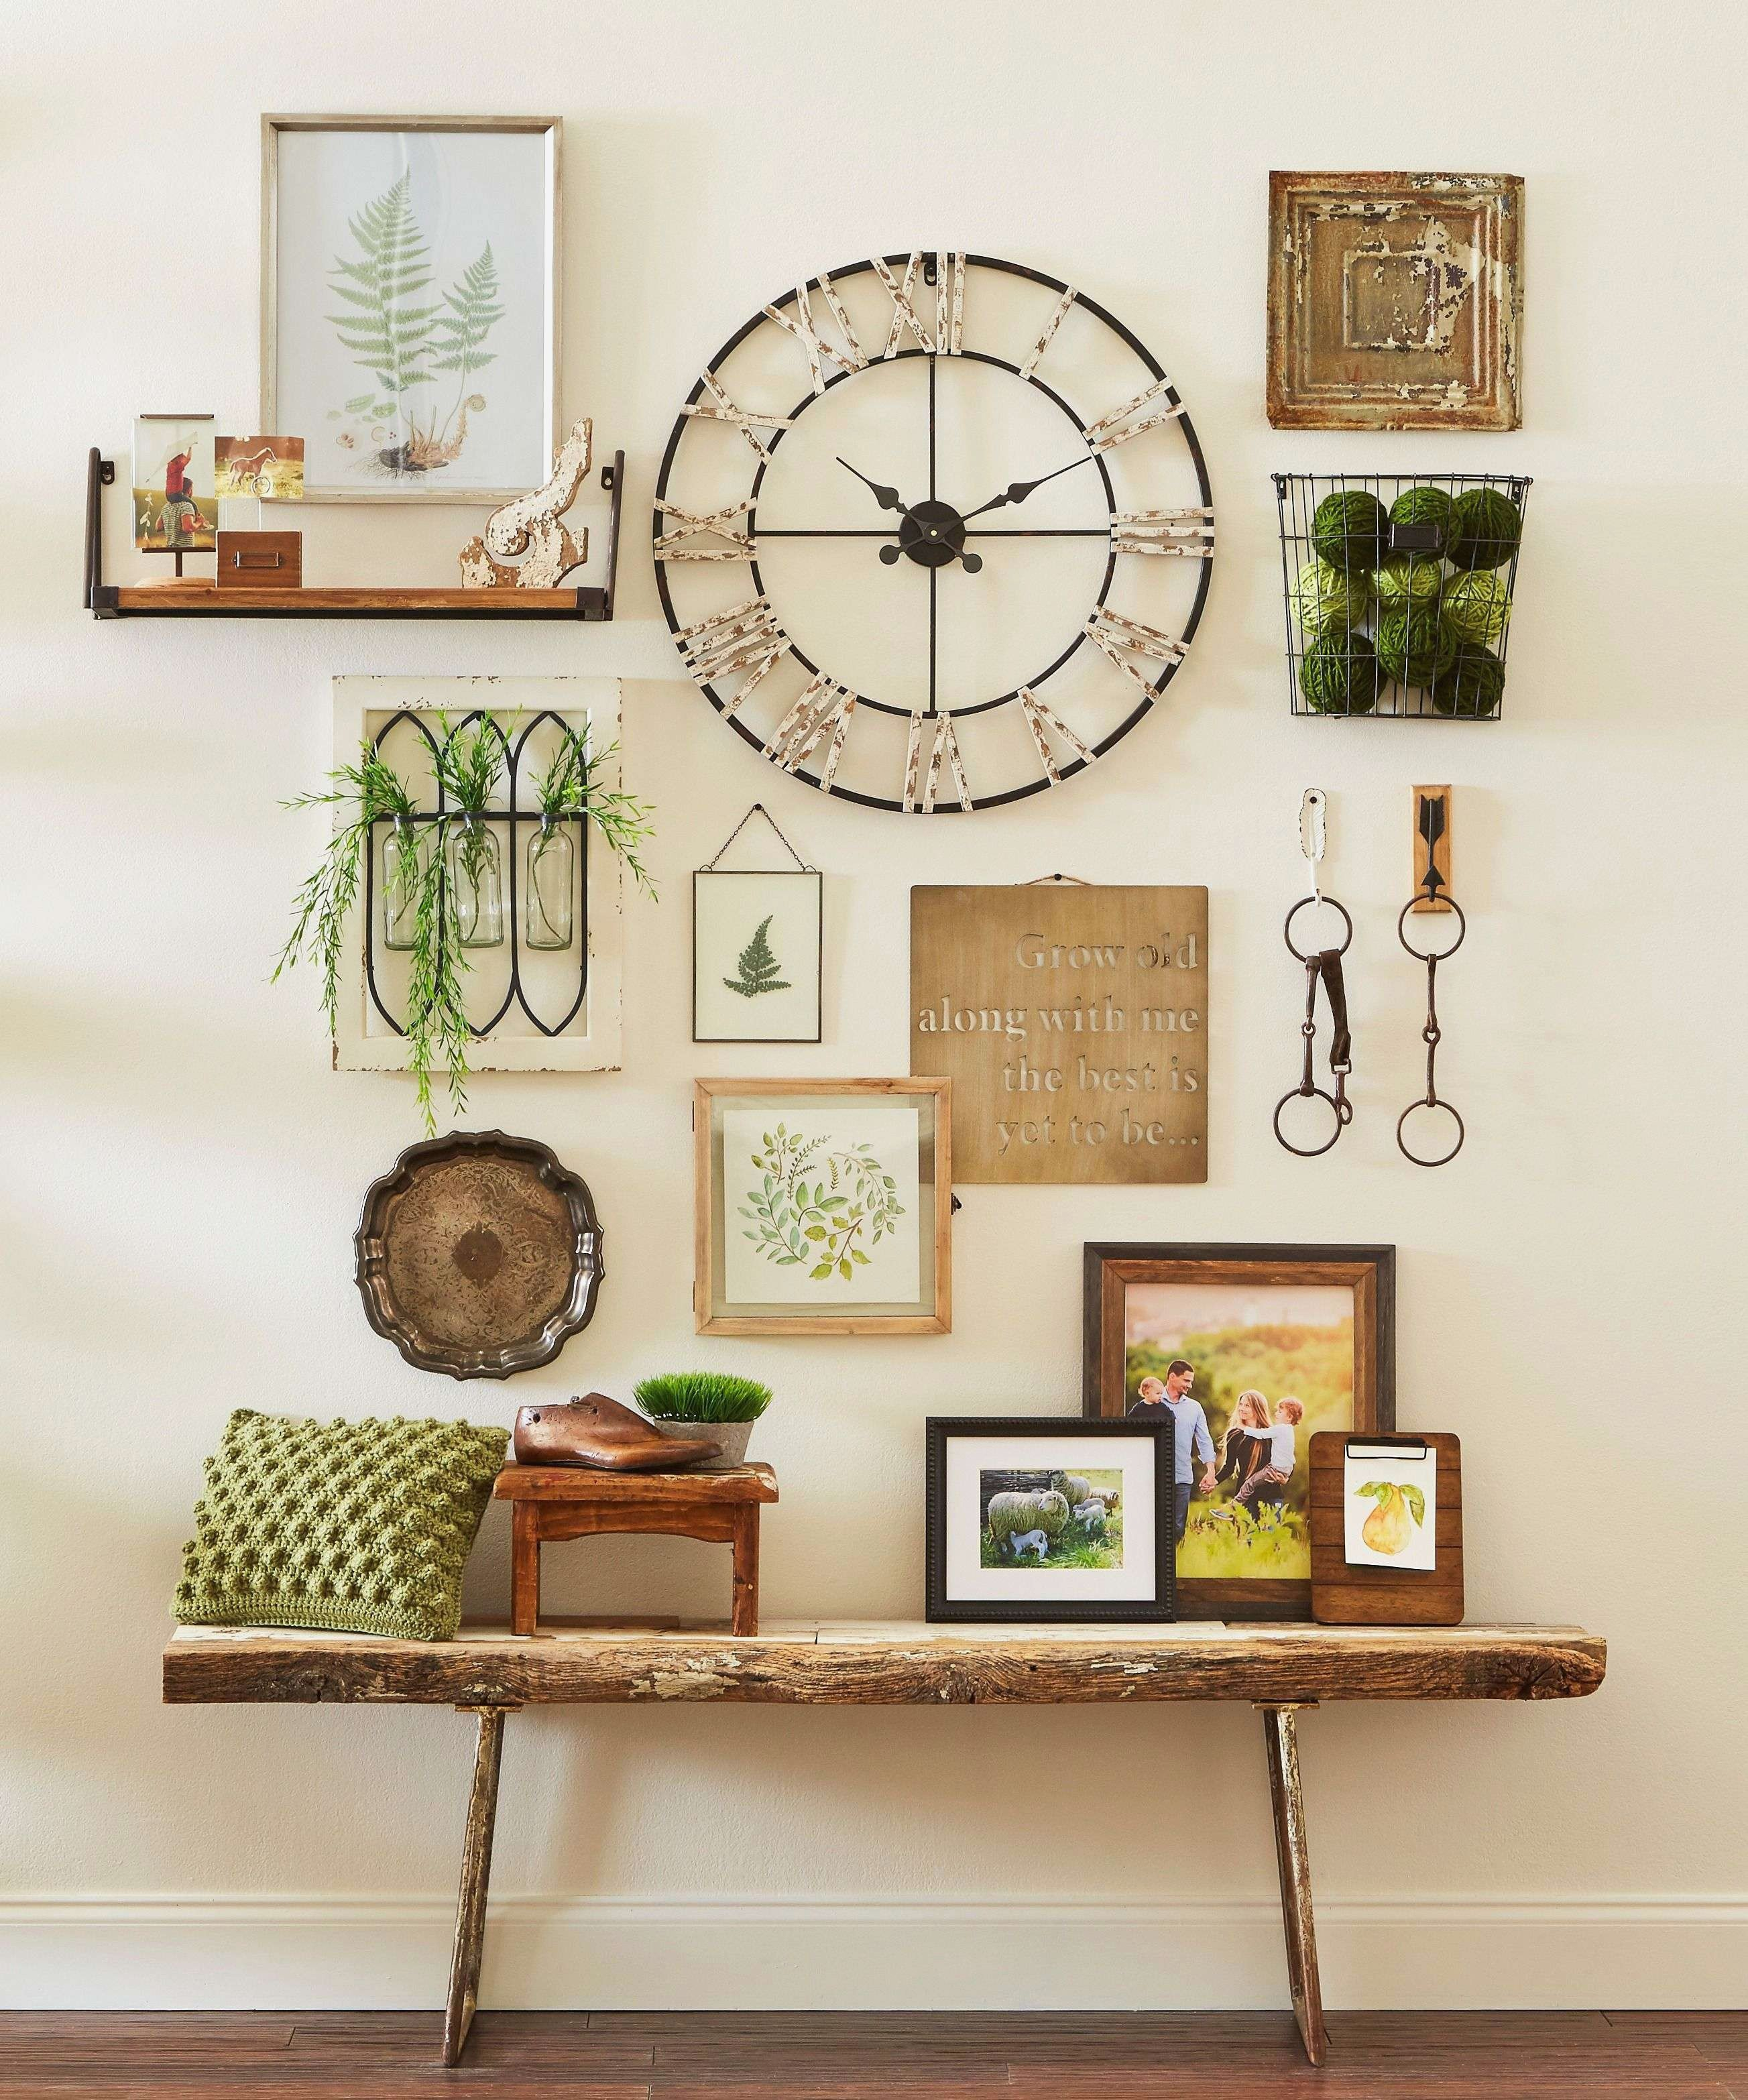 Girl Bedroom Decorating Ideas Best Of Bedroom Simple Easy Diy Good Home Design Best to Furniture